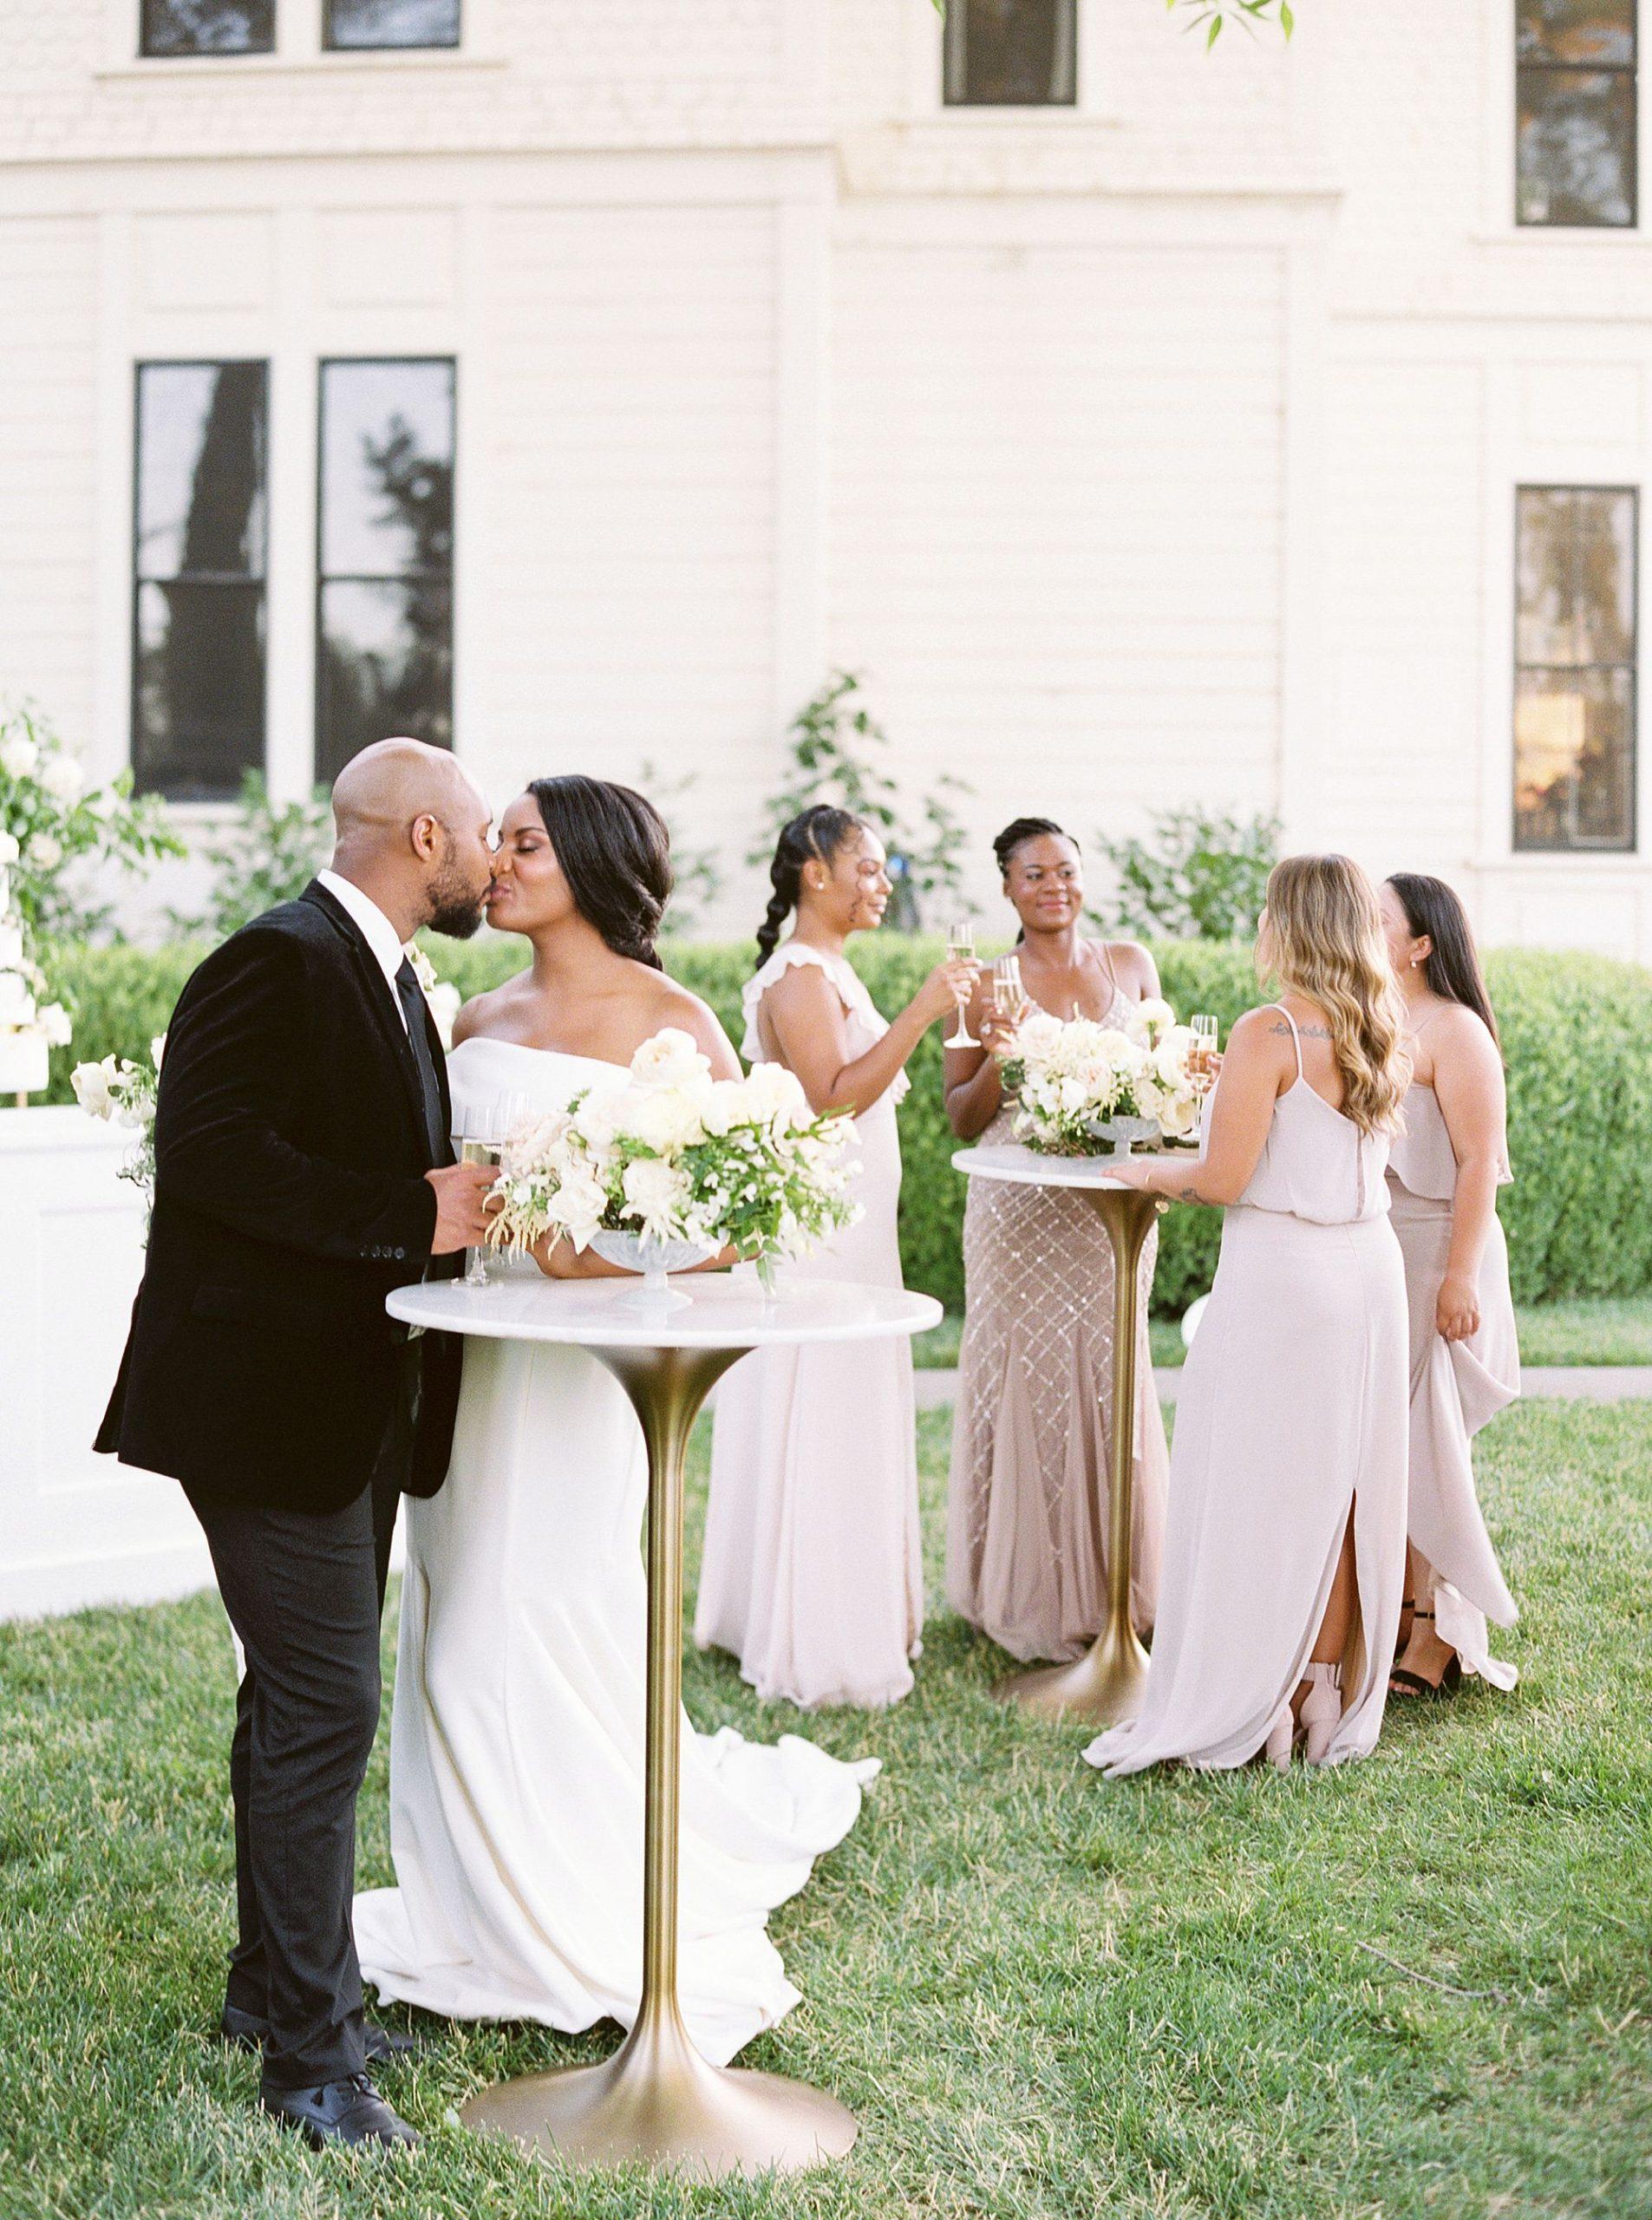 Park Winters Micro-Wedding Inspiration on Style Me Pretty - Stephanie Teague Events - Ashley Baumgartner - Park Winters Wedding - Black Tie Wedding - Micro-Wedding Sacramento Photographer_0036.jpg